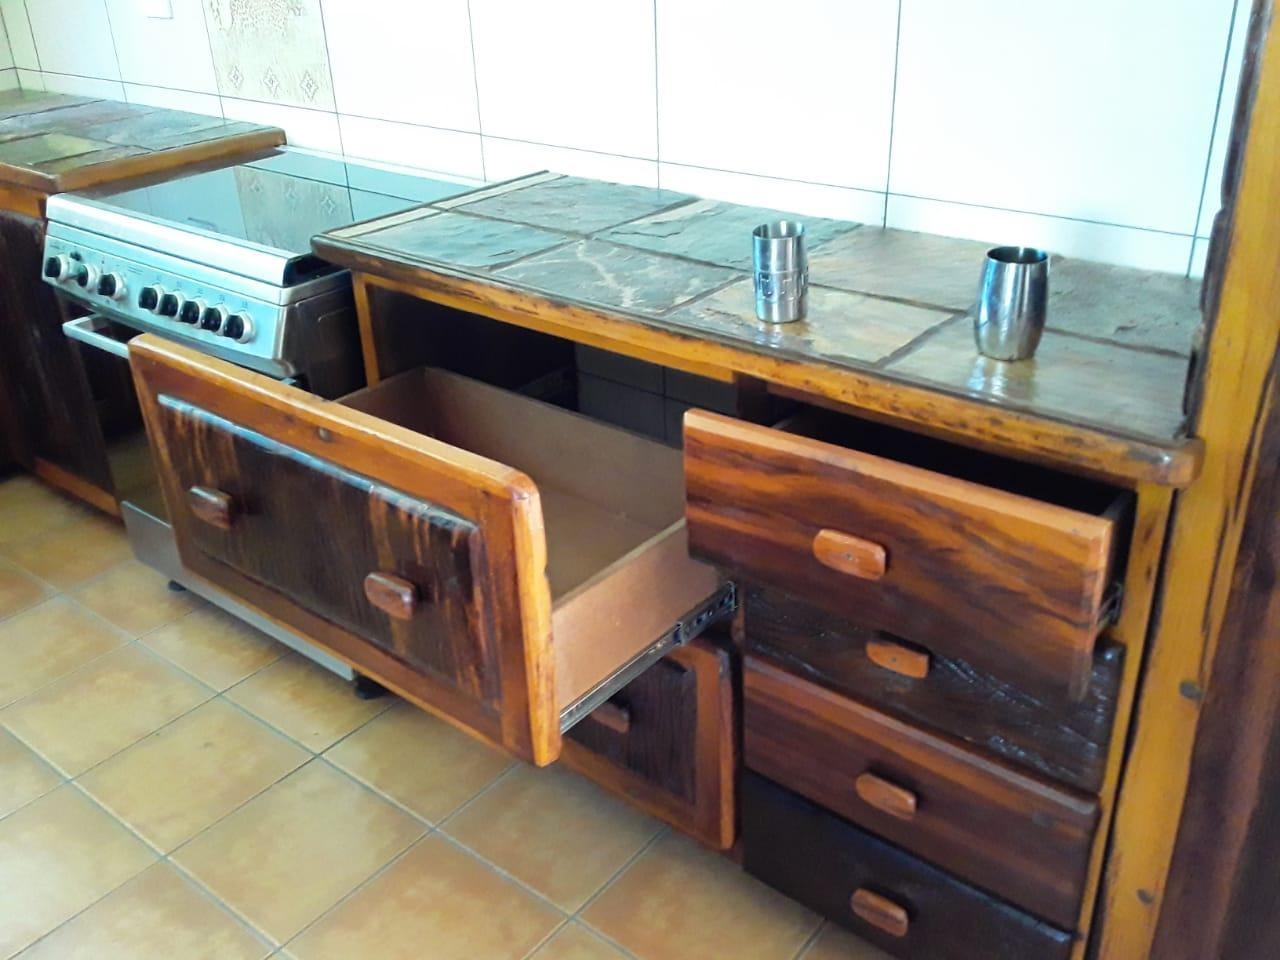 Kitchen cupboard with drawer